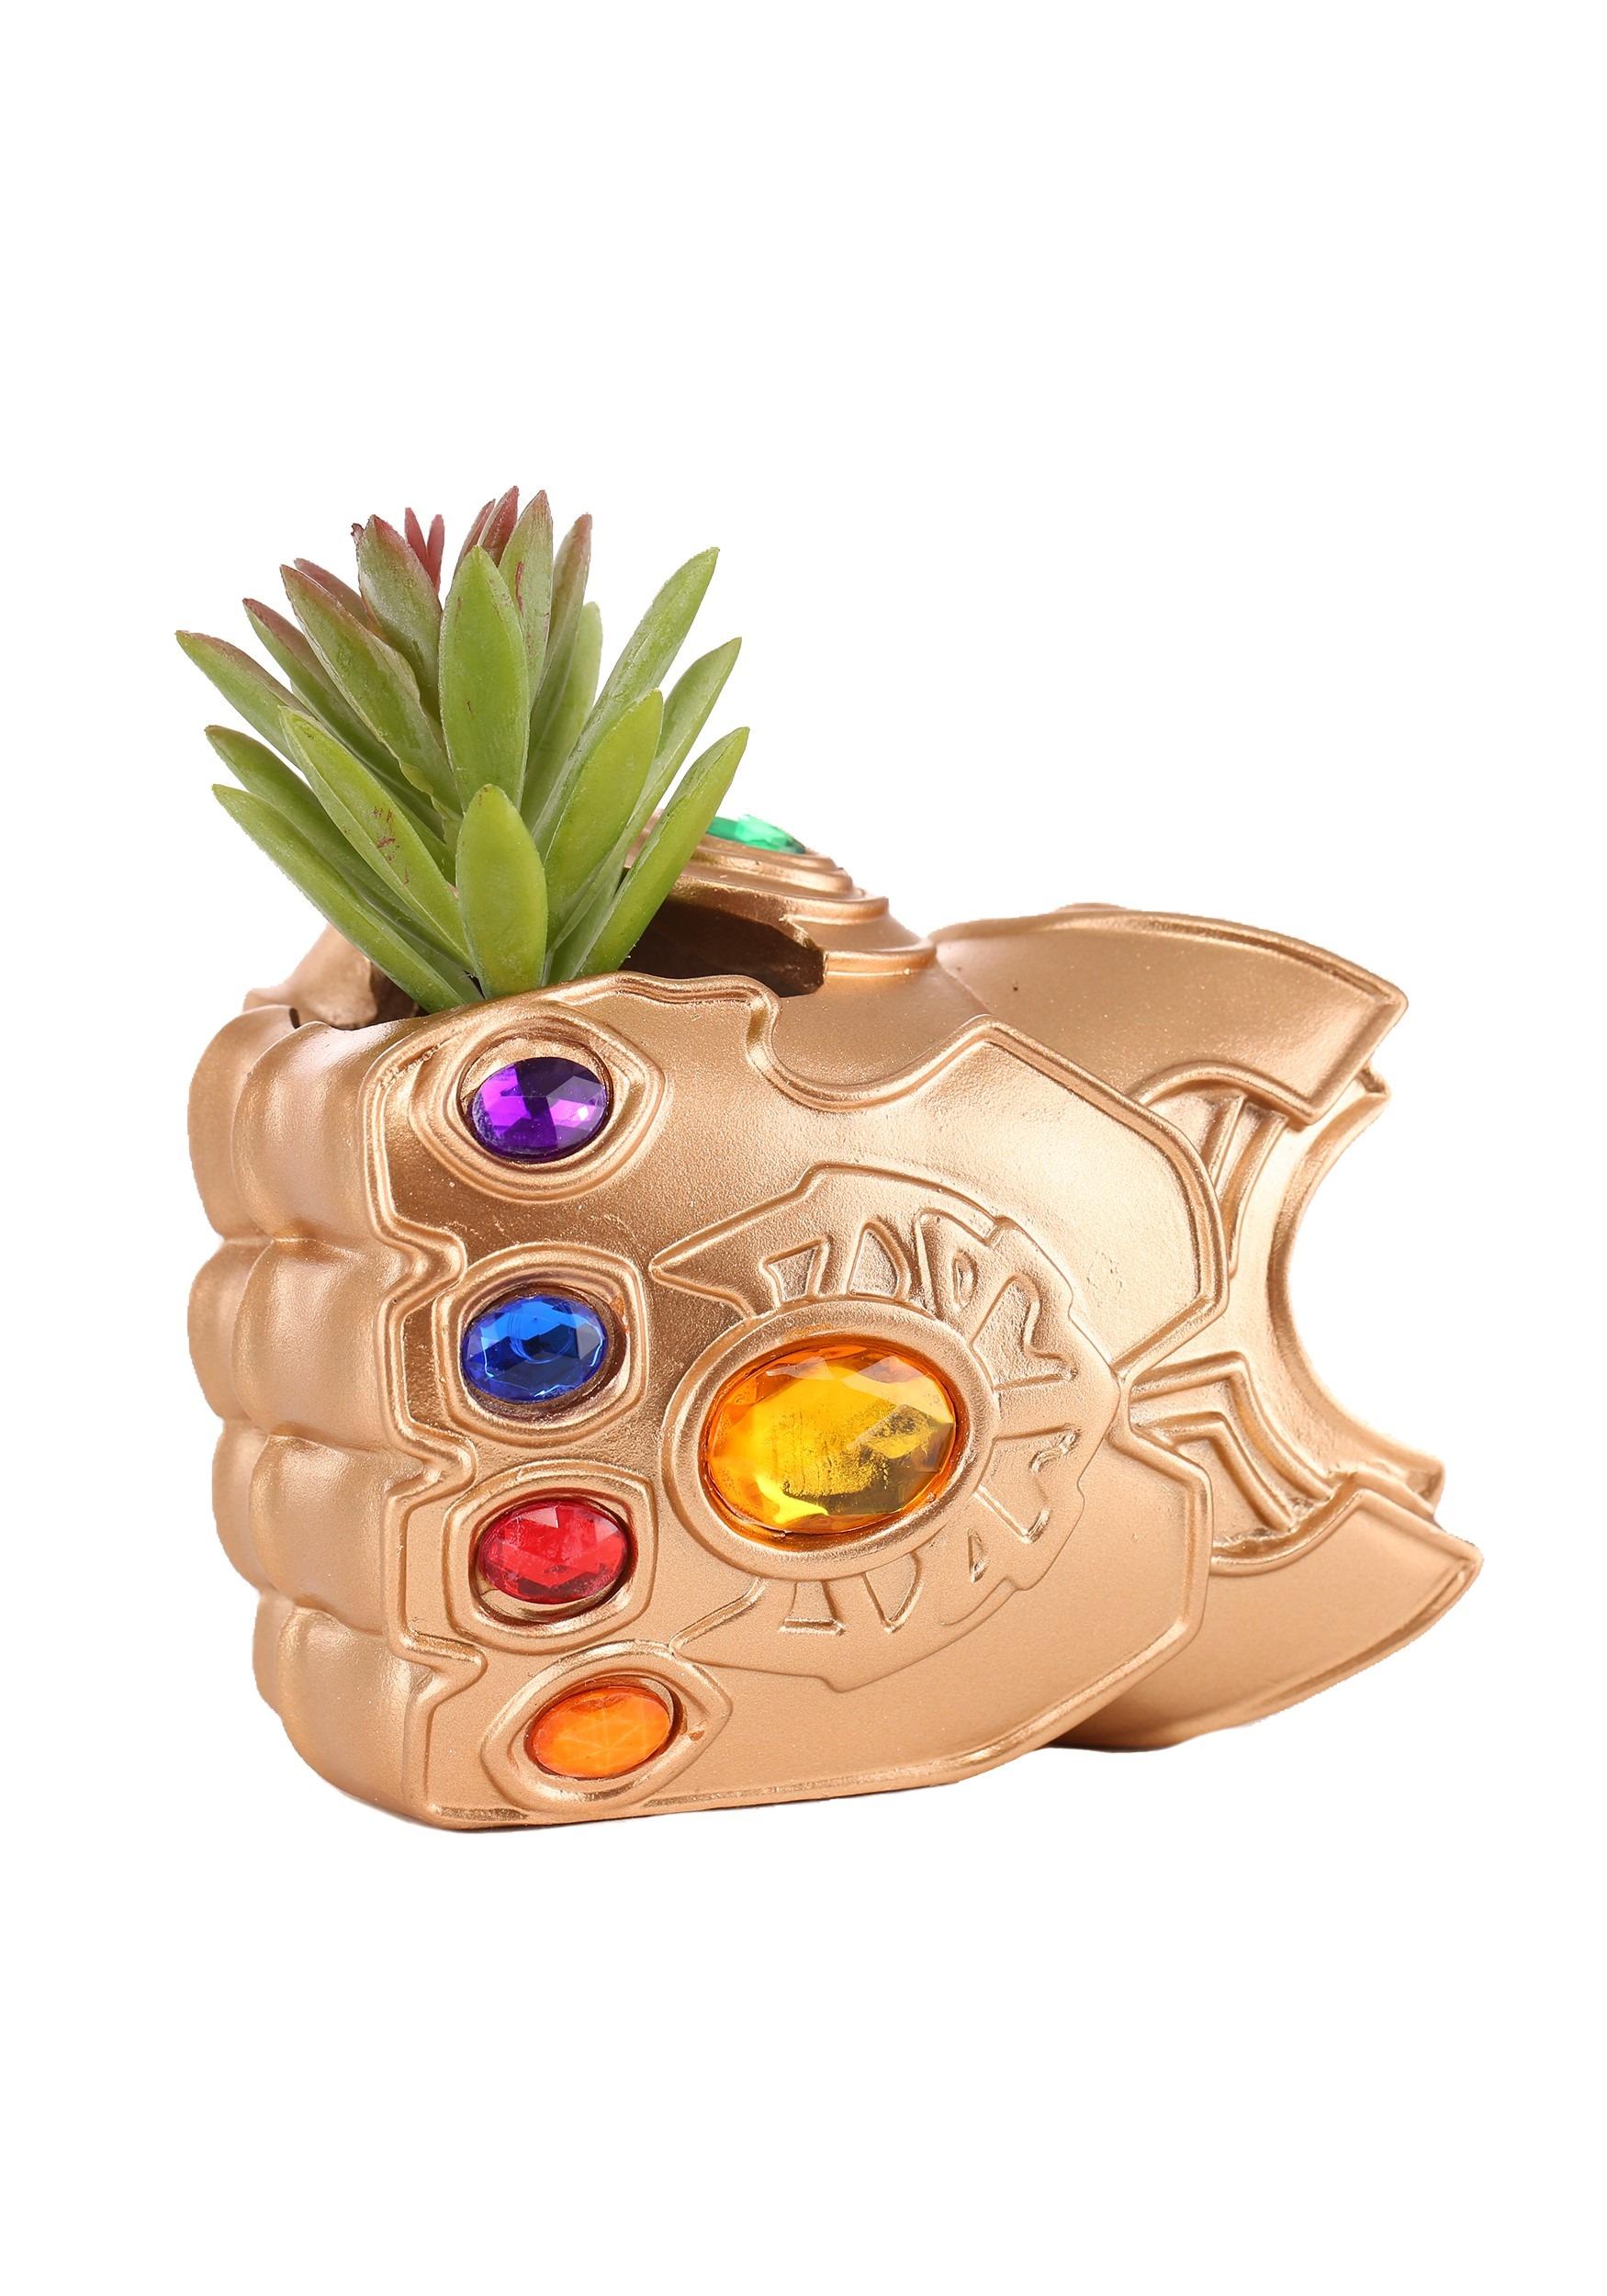 Marvel Avengers Infinity Gauntlet Planter